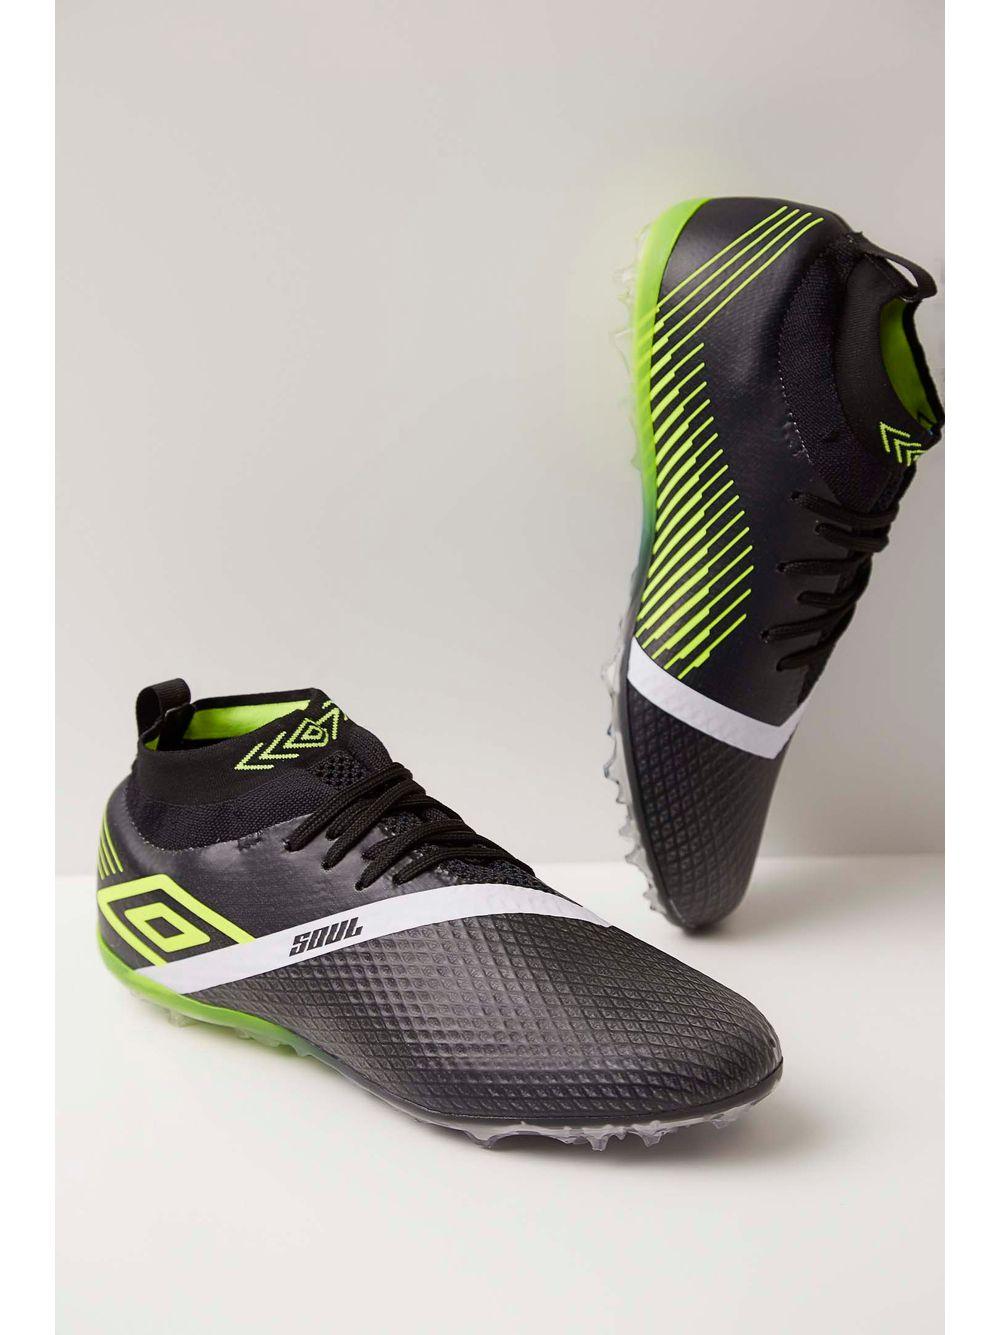 448f80f037 Chuteira Society Soccer Shoes Umbro Soul Knit 0f71094 Preto - pittol